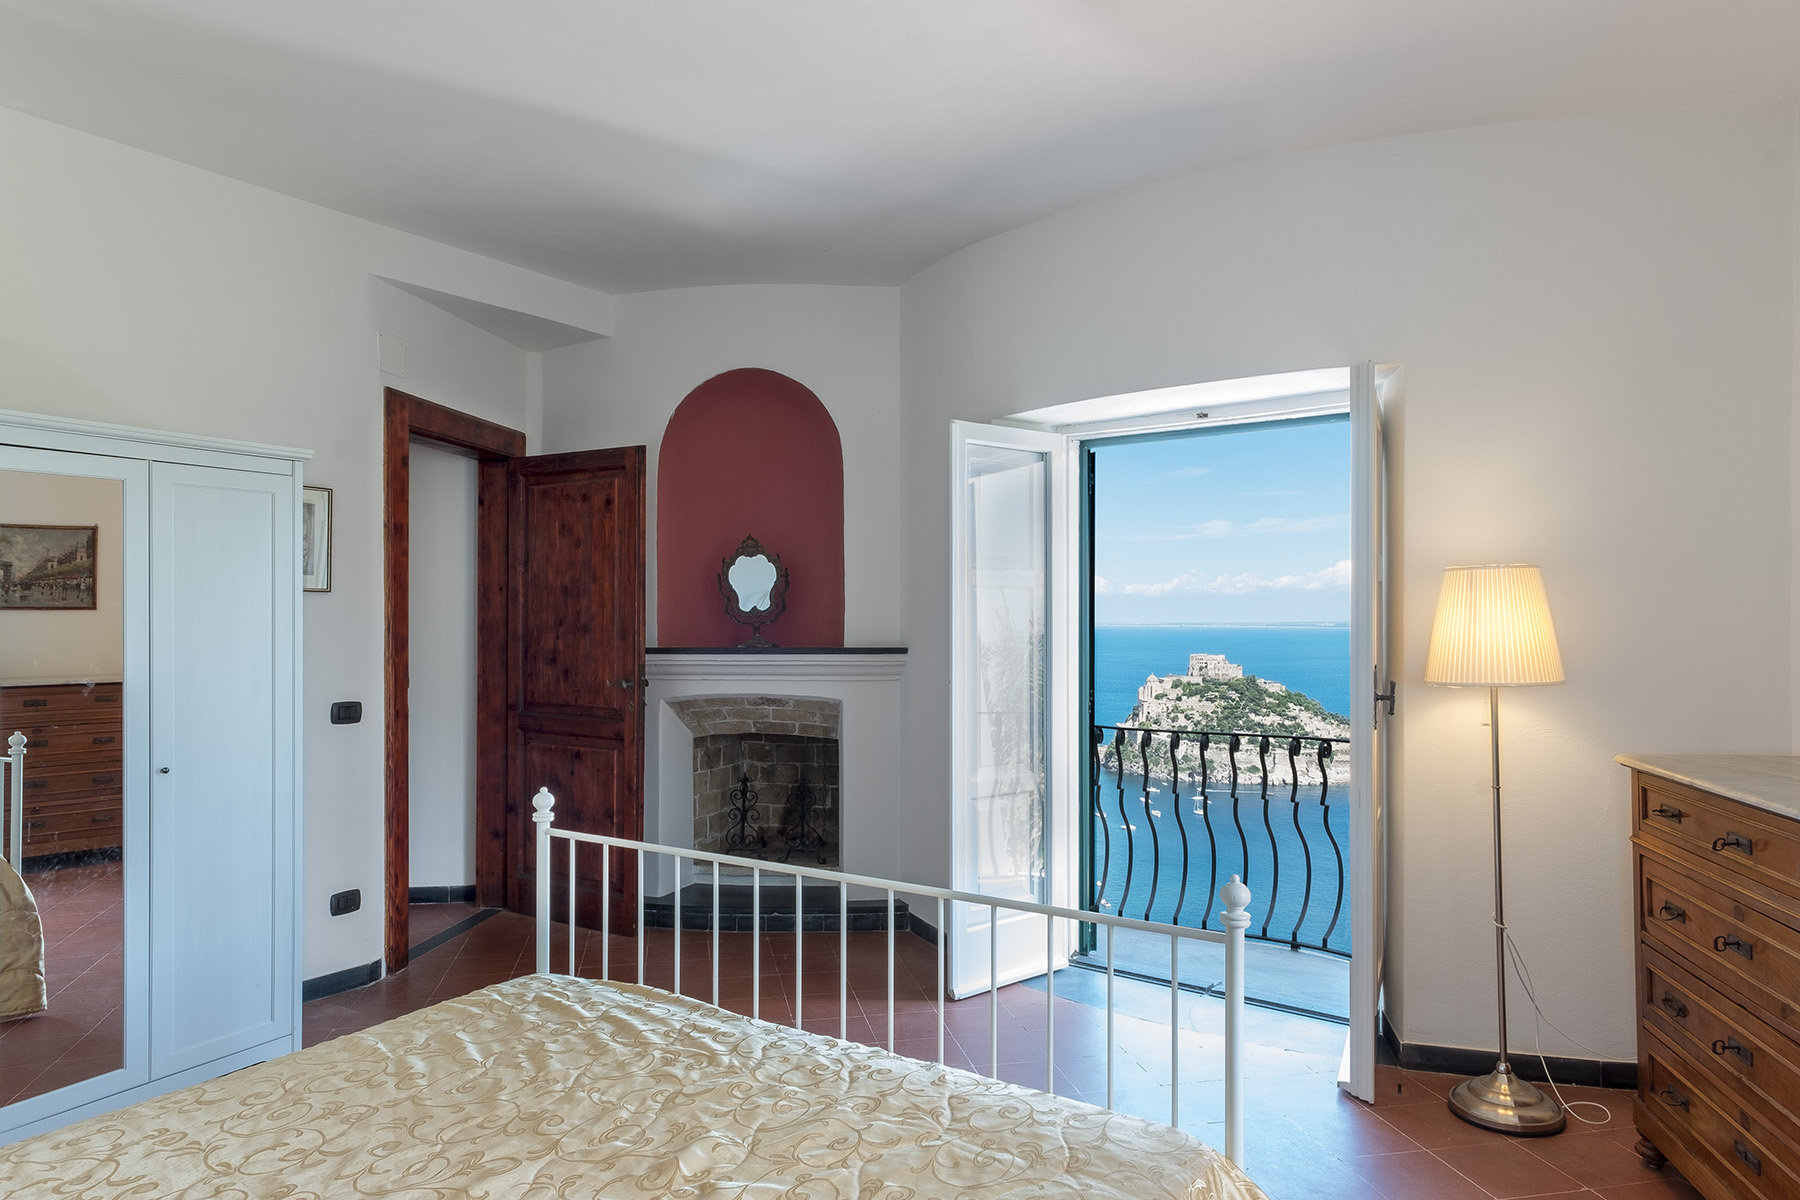 Villa in Vendita a Ischia: 5 locali, 500 mq - Foto 19